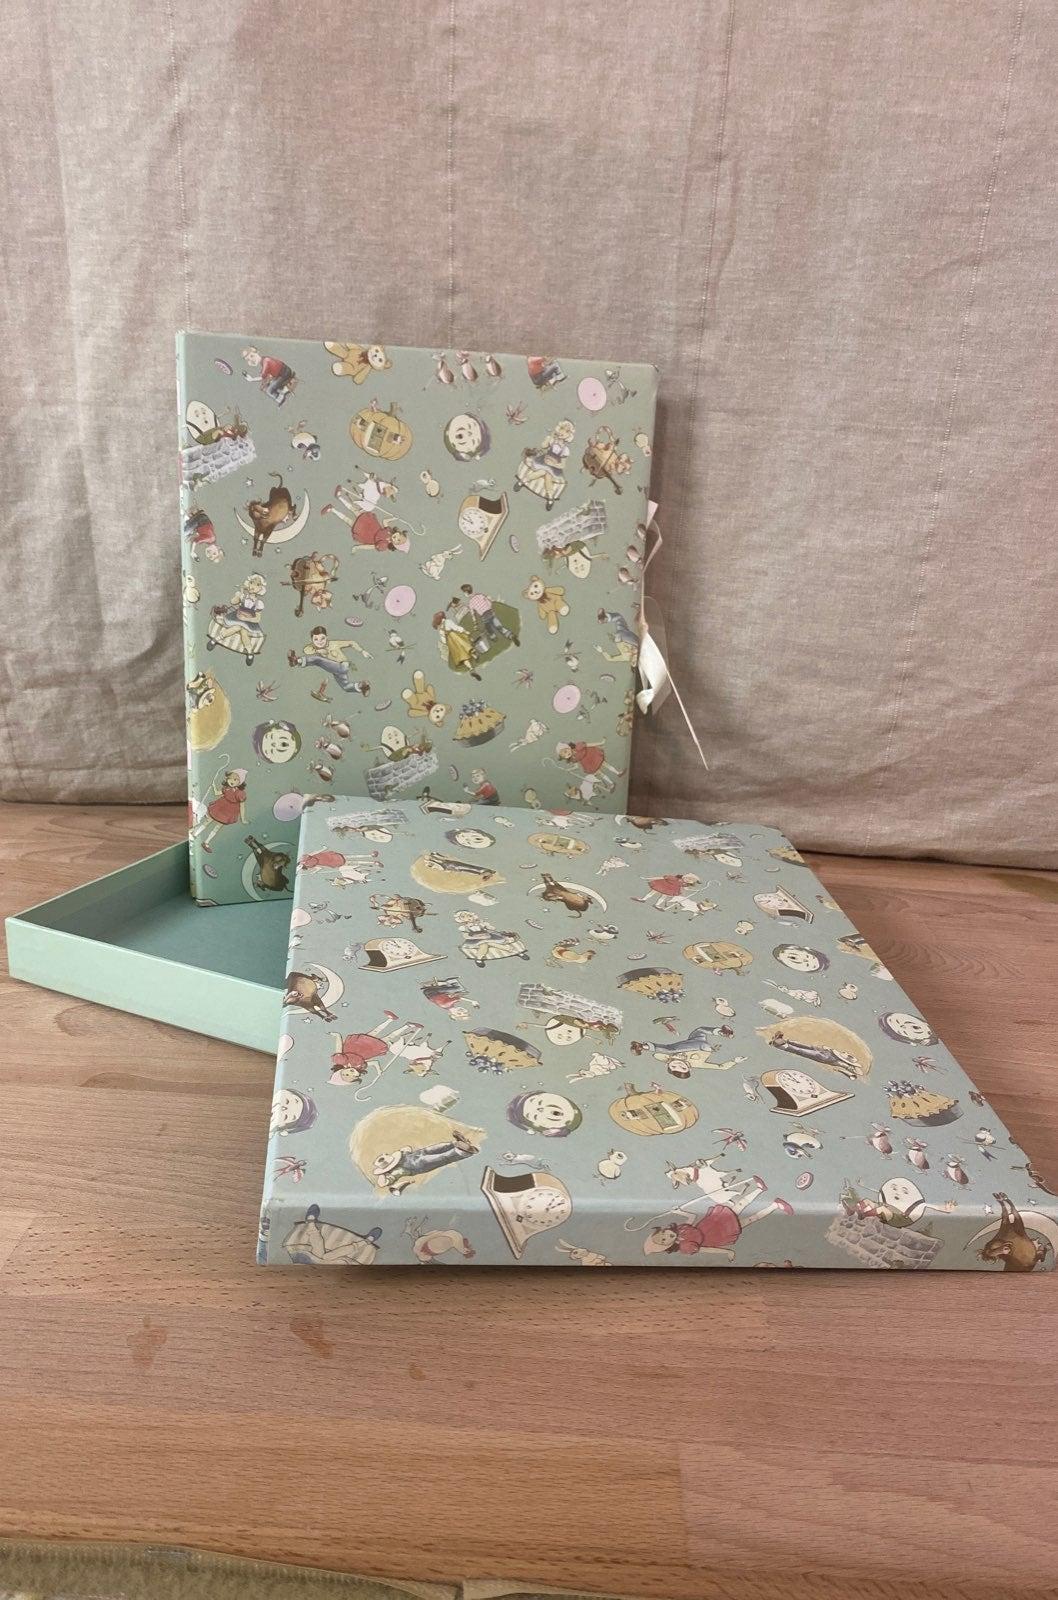 Baby scrap book in box